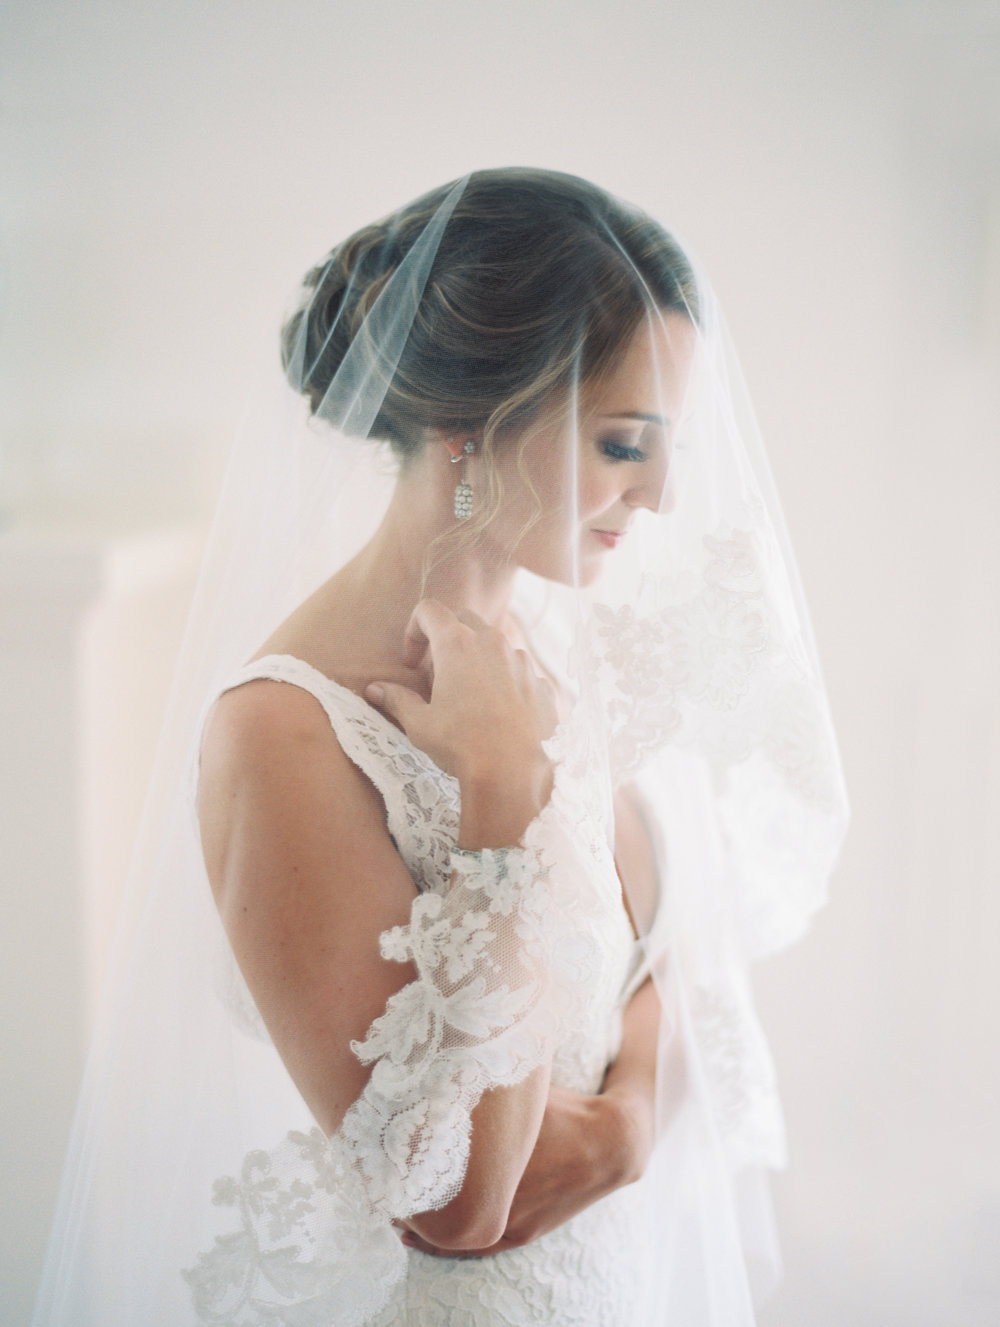 097-fine-art-film-photographer-carmel-california-destination-wedding-brumley-wells-tim-courtney.jpg